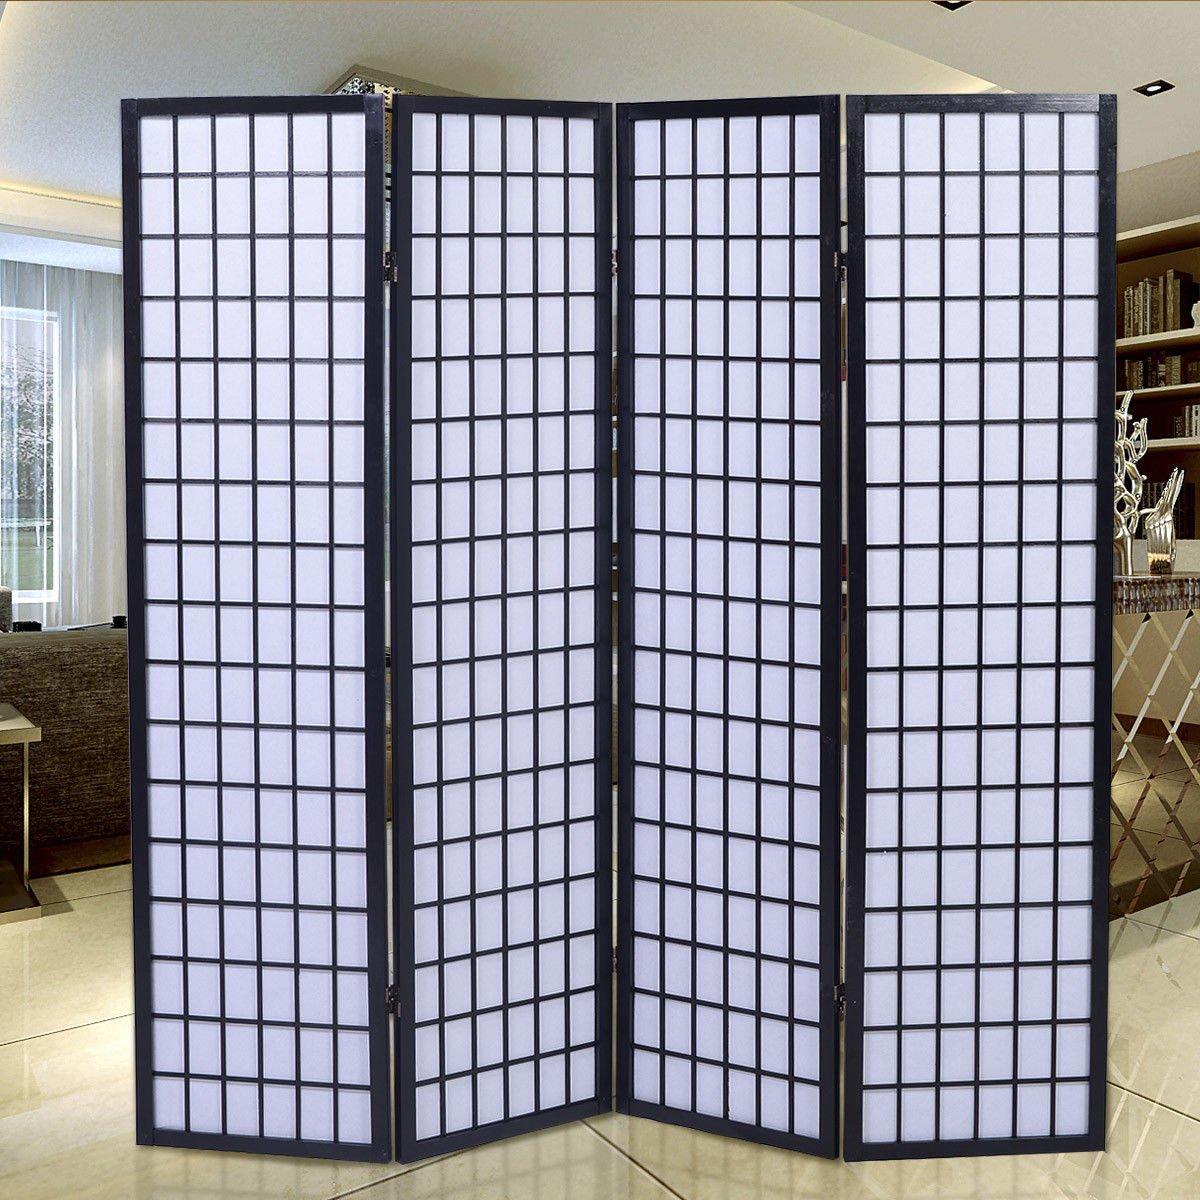 Giantex 4-Panel Room Divider Solid Shoji Wood Folding Privacy Screen Black